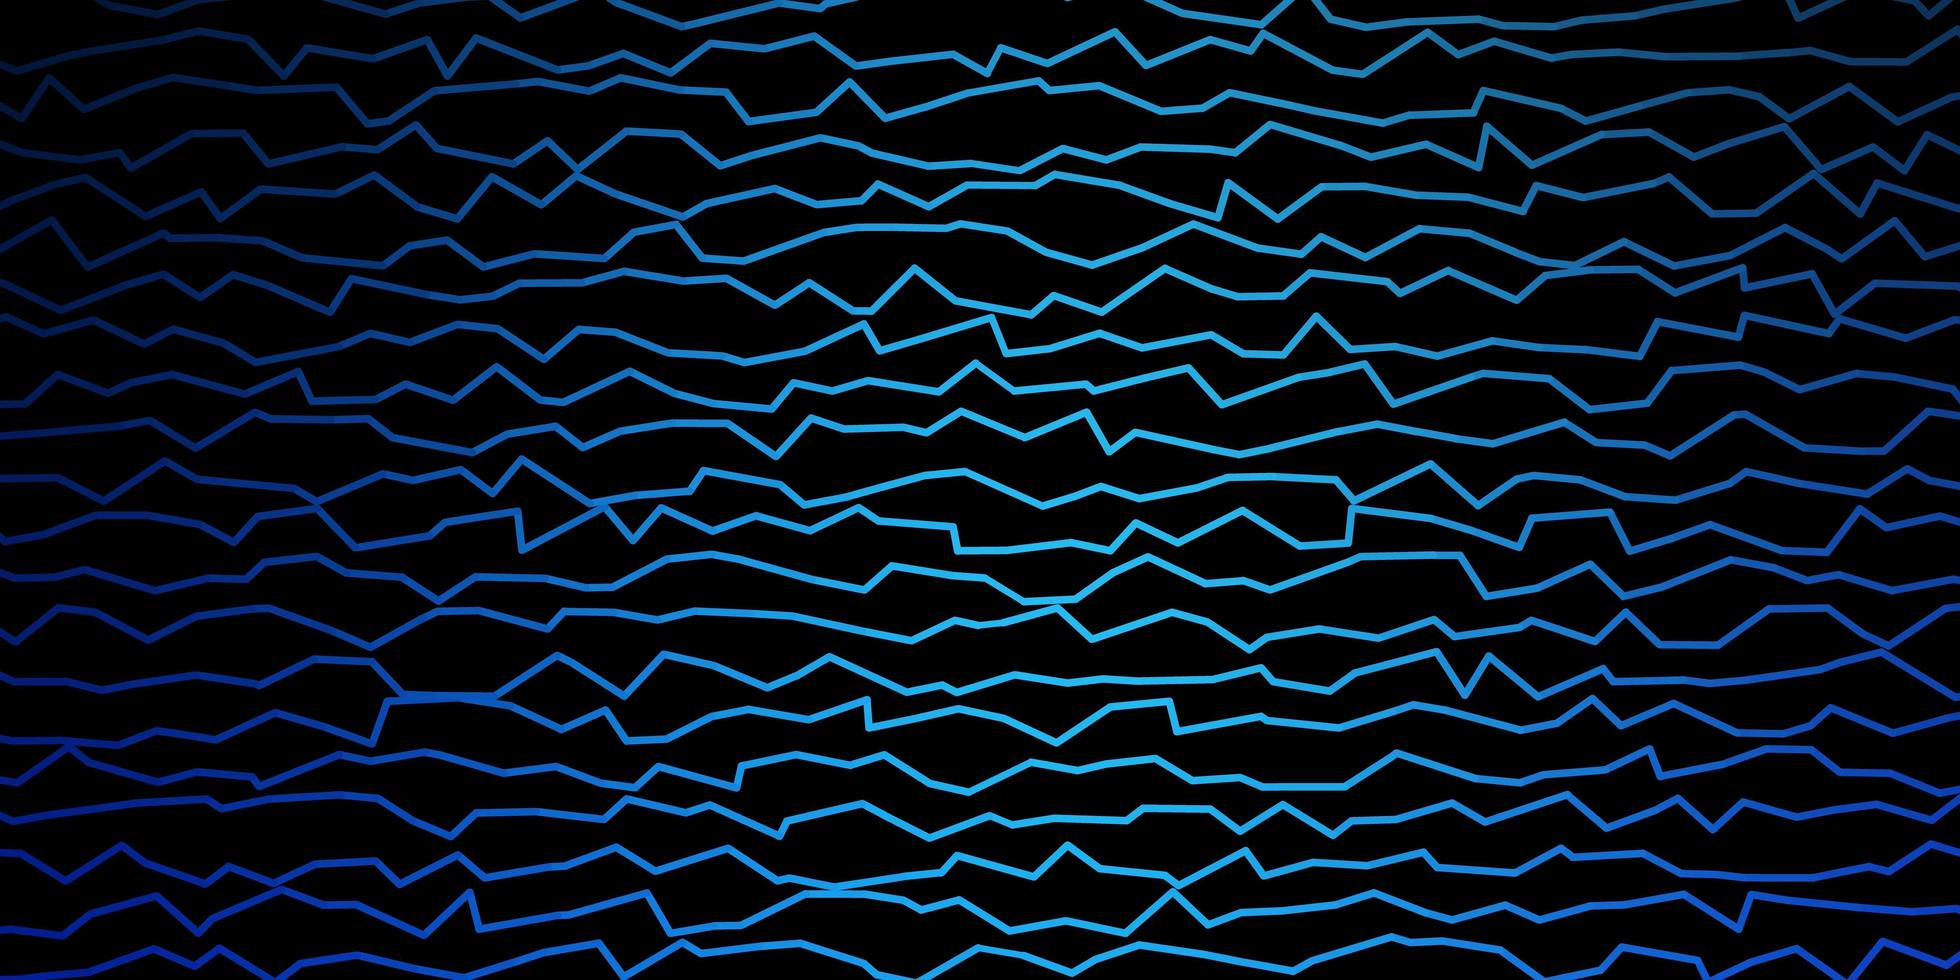 dunkelblaue Vektortextur mit Kurven vektor